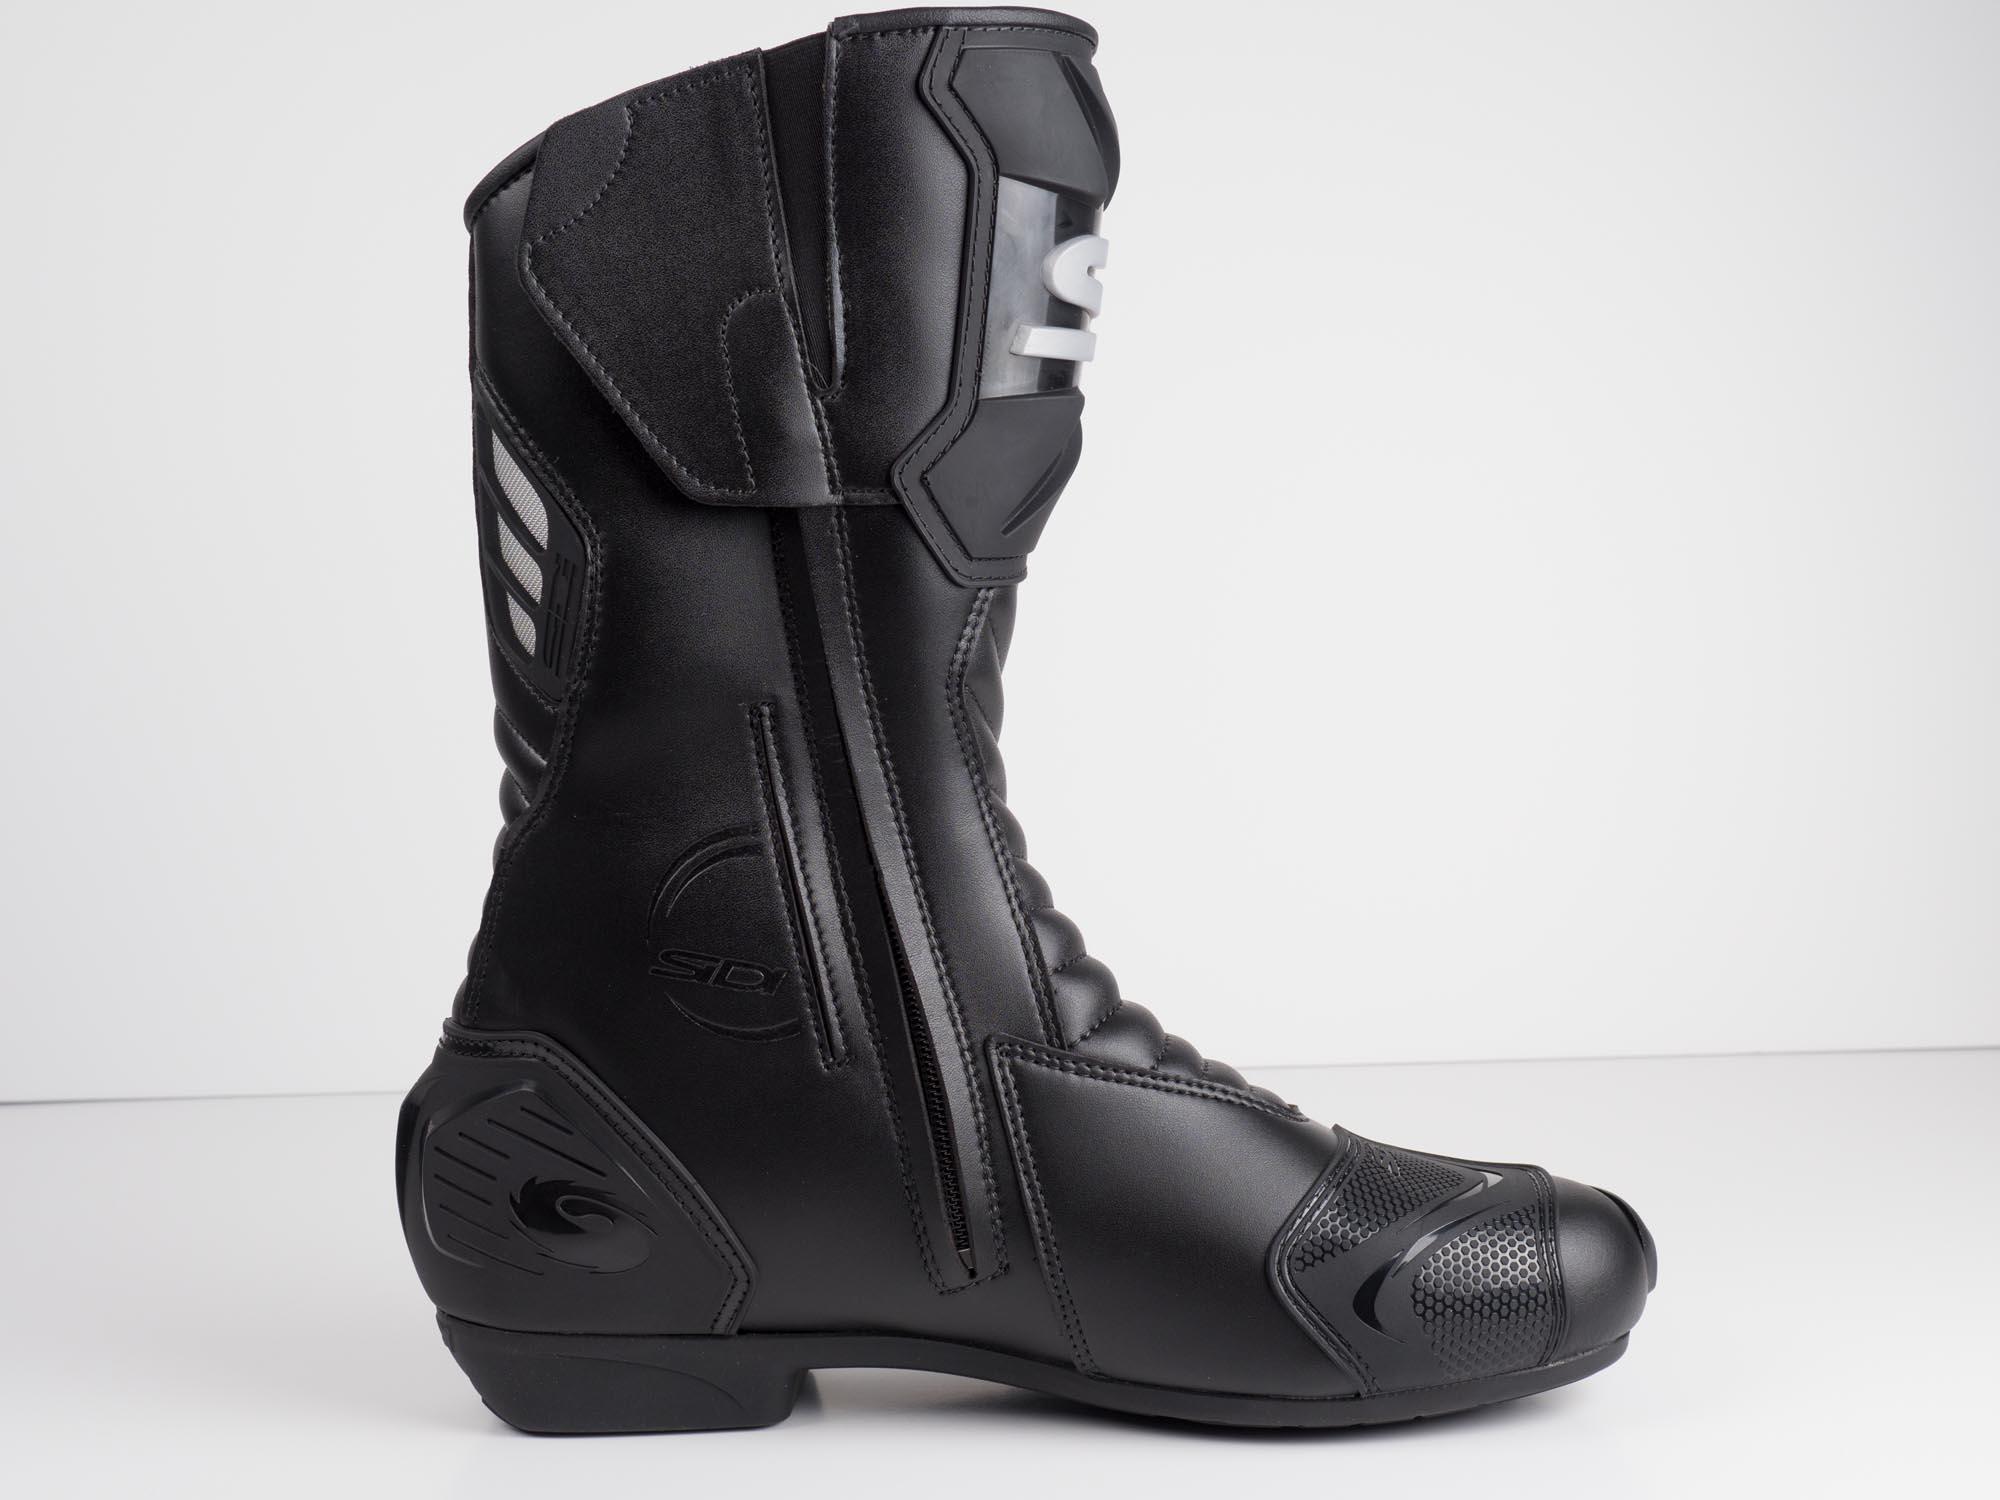 Sidi Performer Gore-Tex Motorcycle Boots 7.5//41, Black